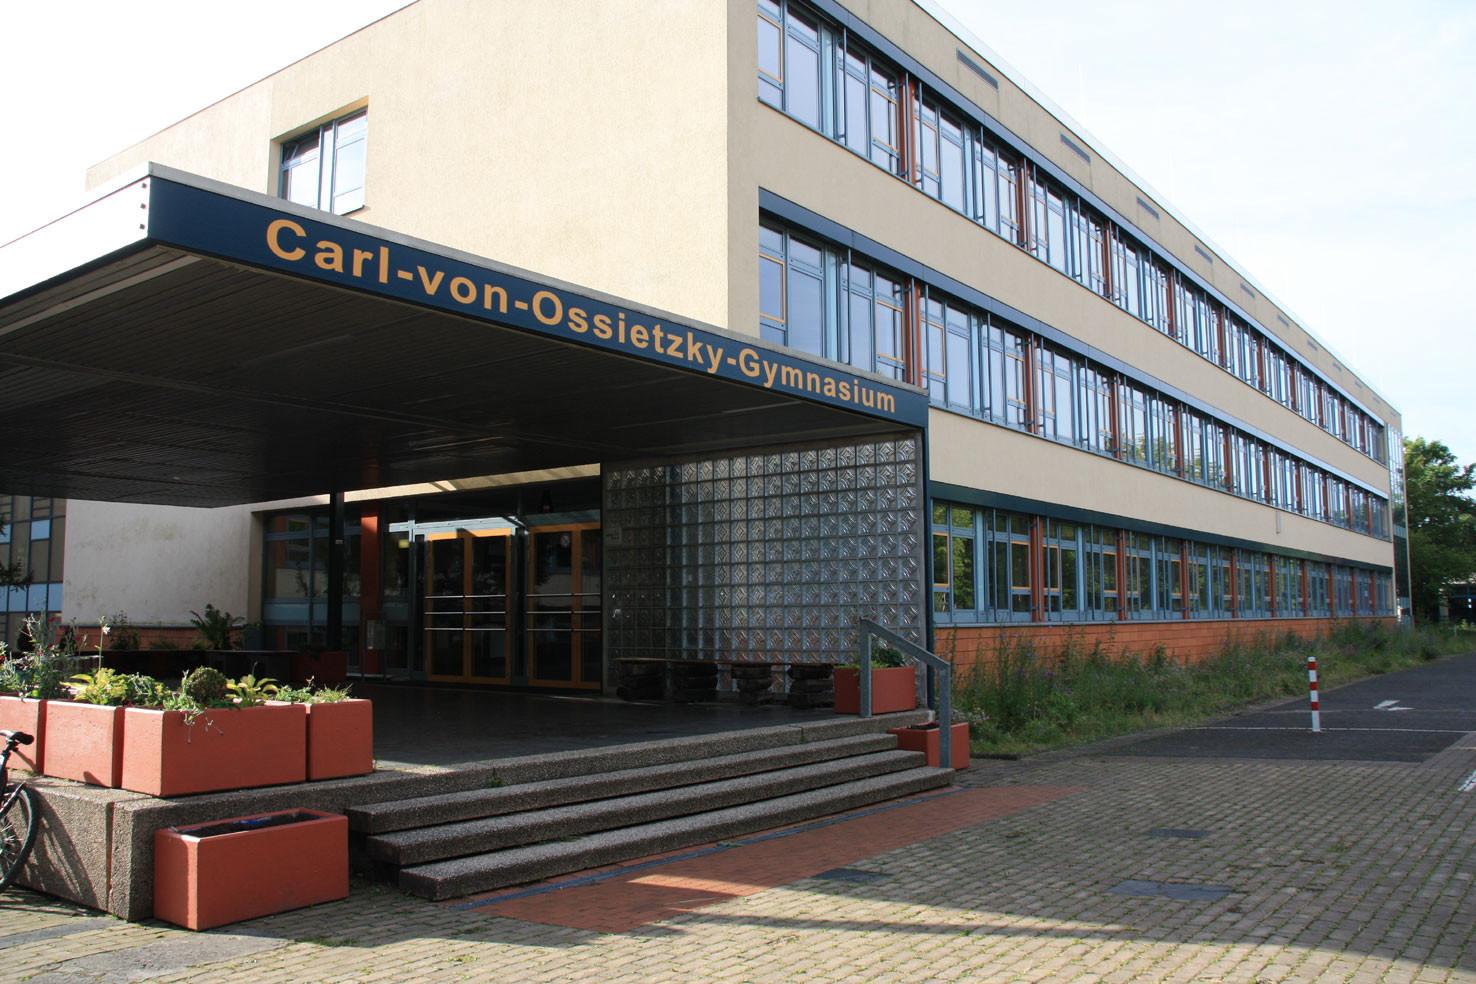 Carl-von-Ossietzky Gymnasium, Ückesdorf